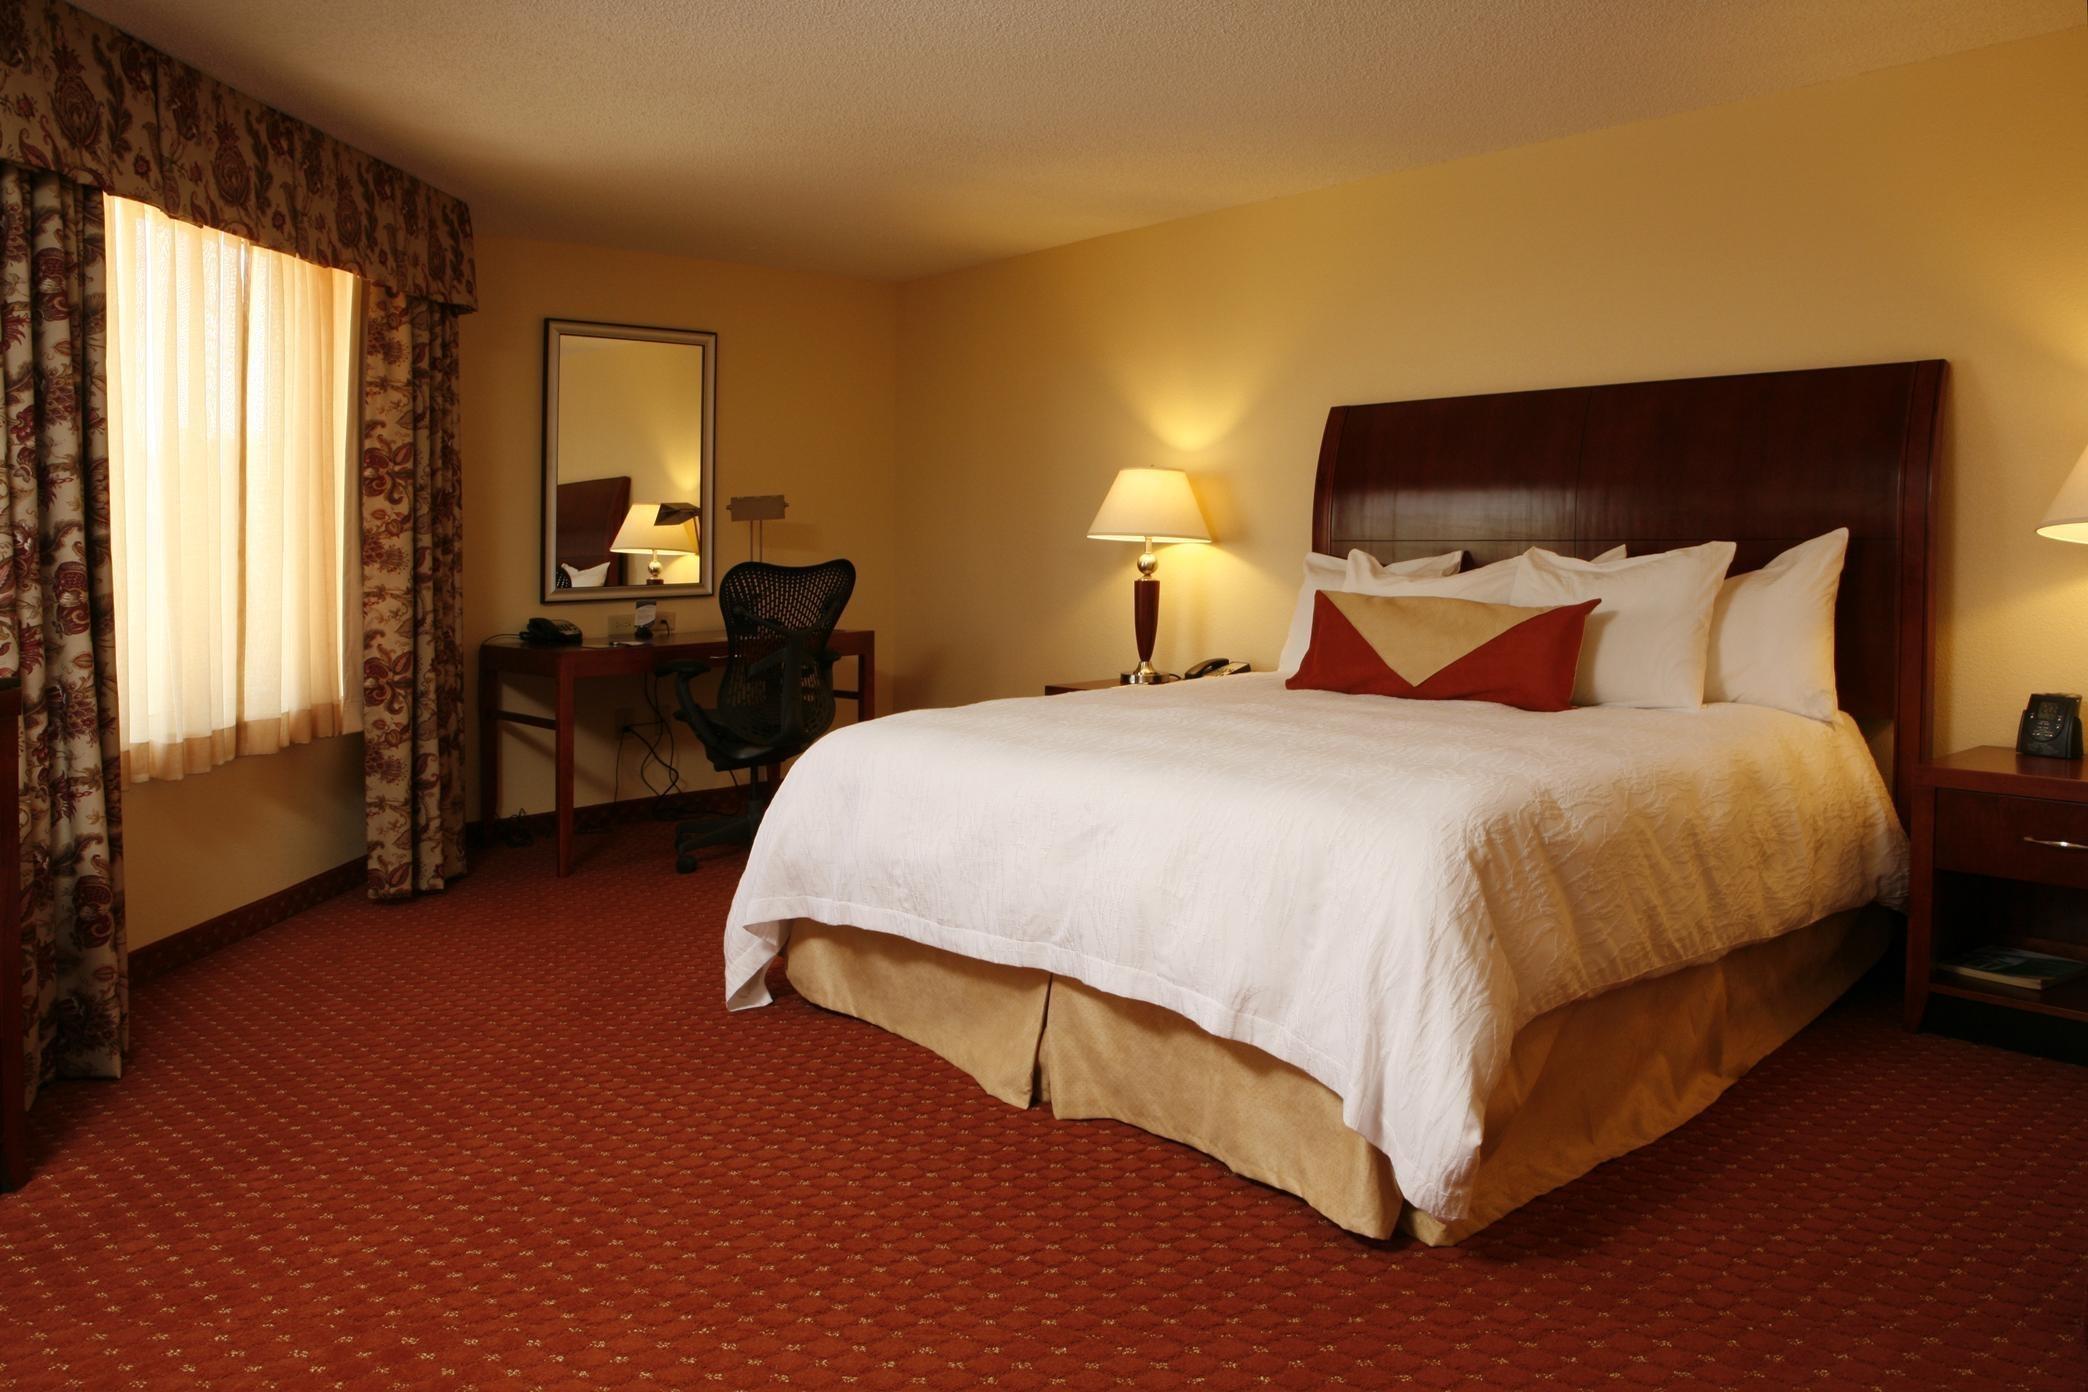 Hilton Garden Inn Roanoke Rapids Coupons Roanoke Rapids Nc Near Me 8coupons